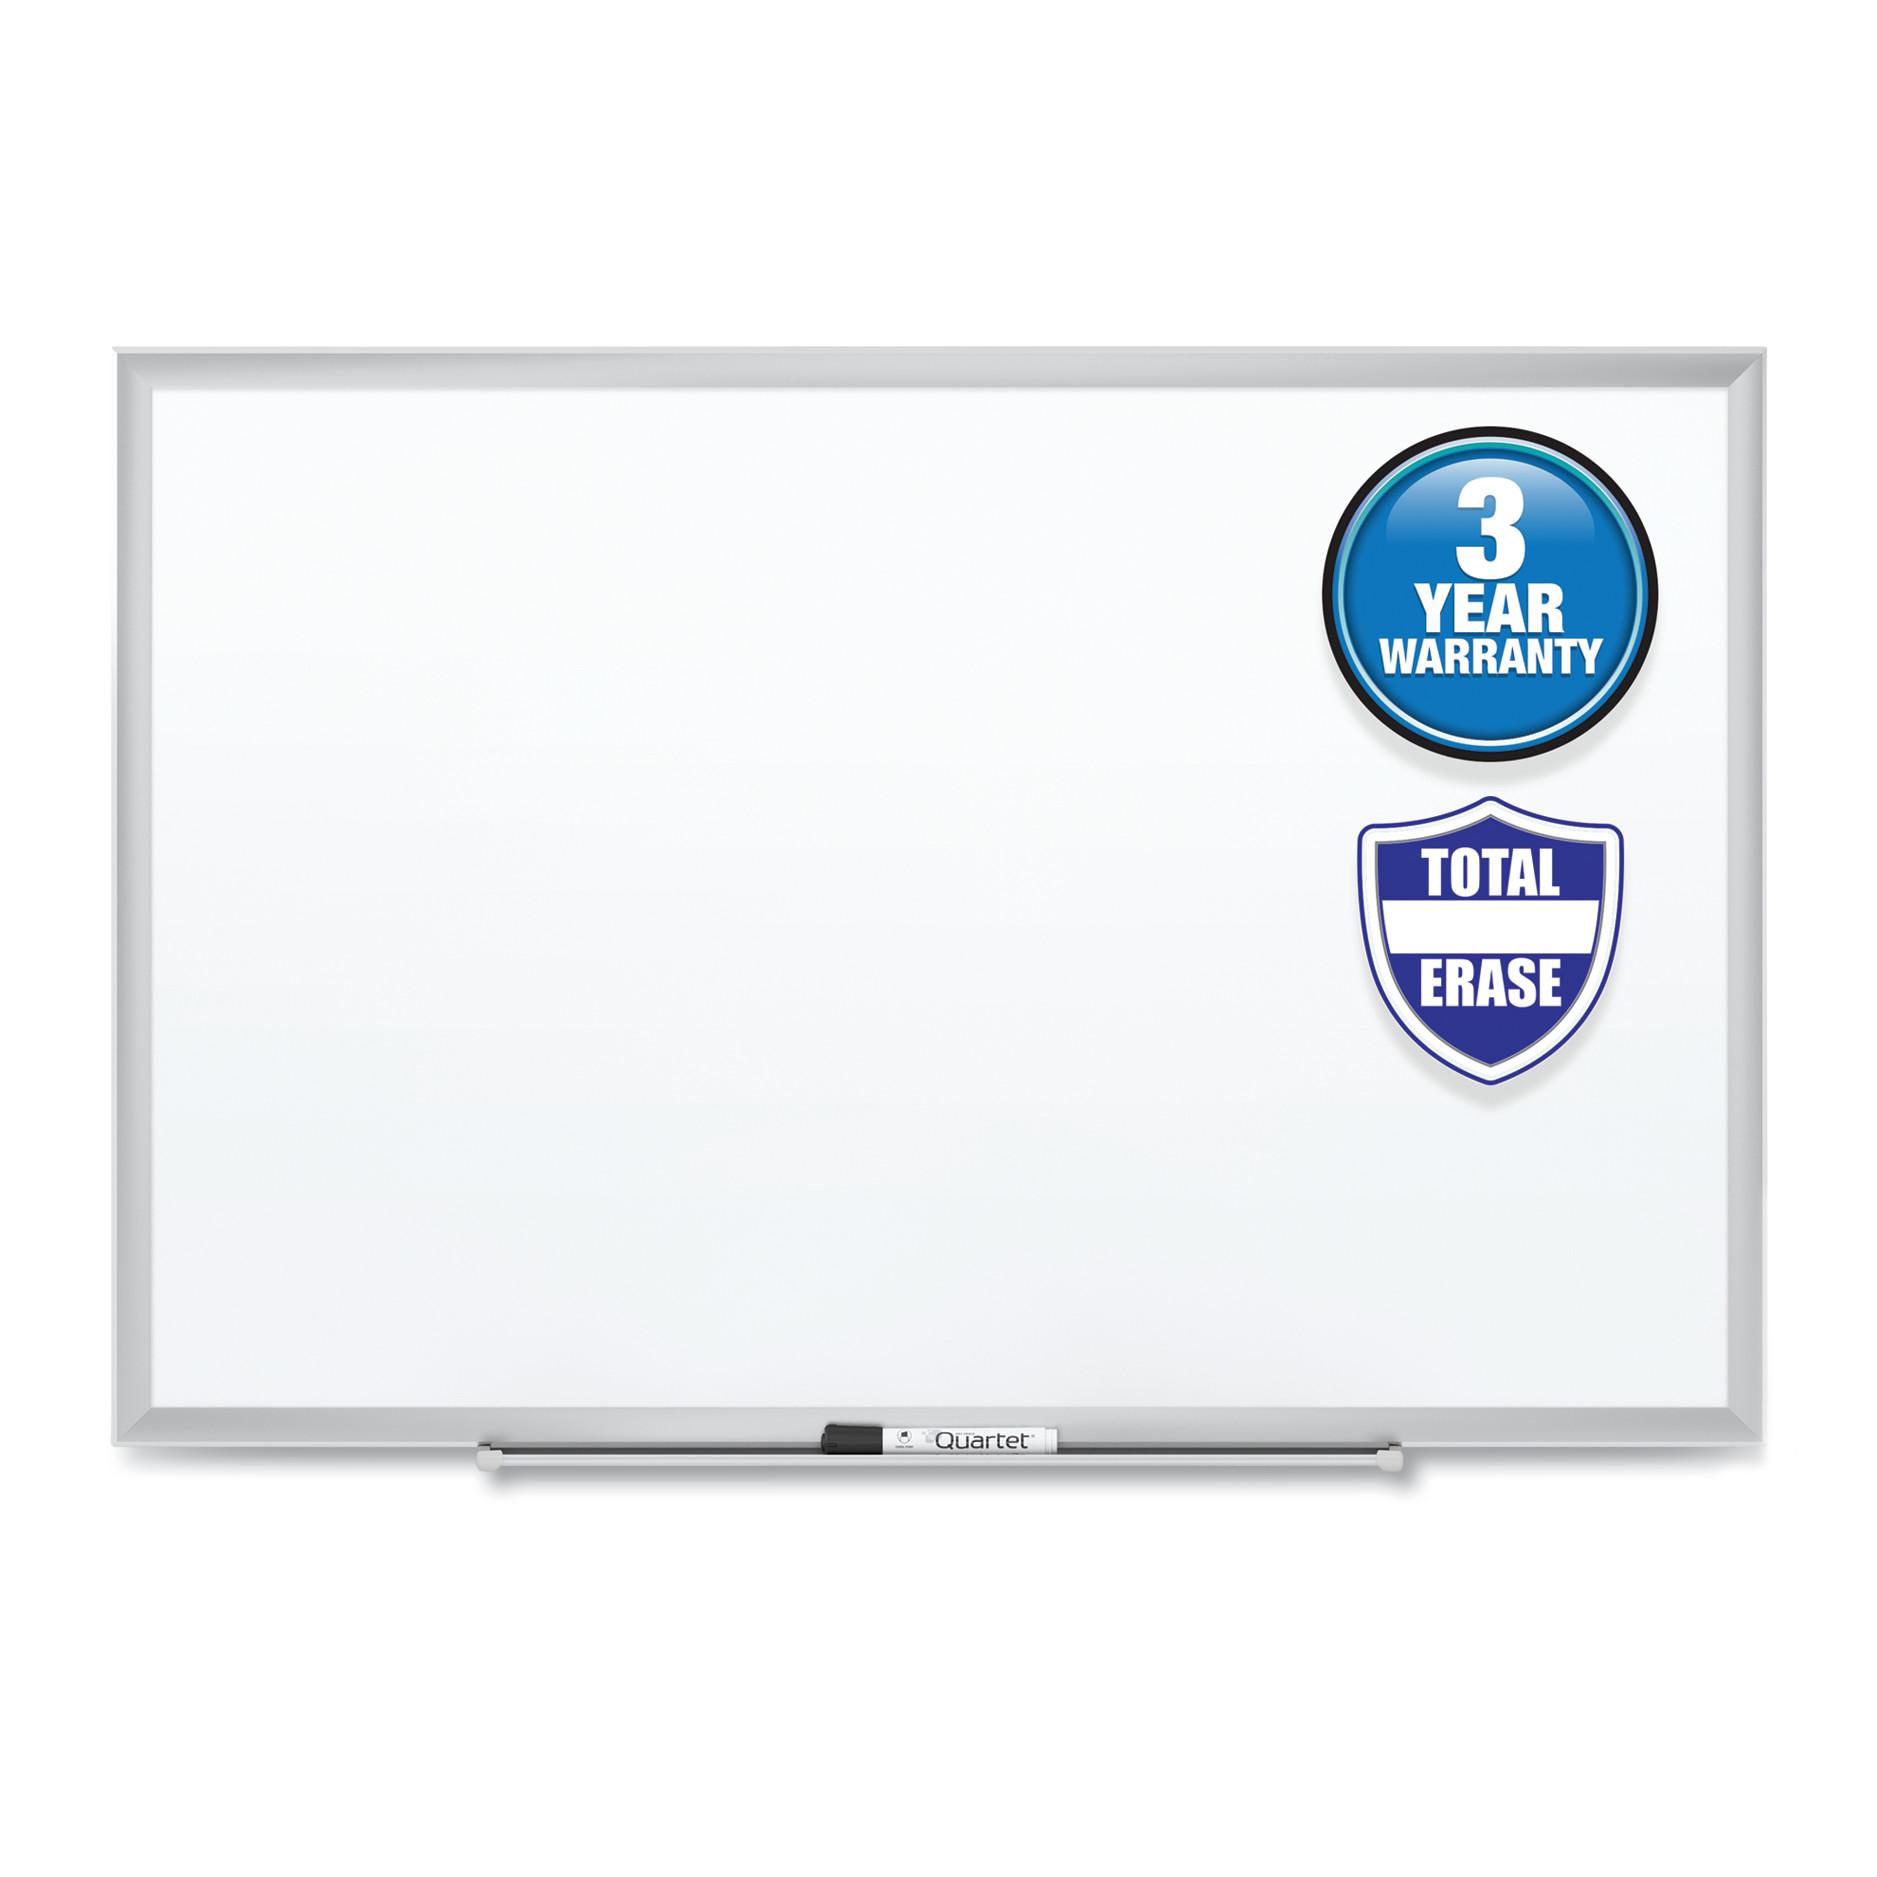 Classic Series Total Erase Dry Erase Board, 24 x 18, Silver Aluminum Frame